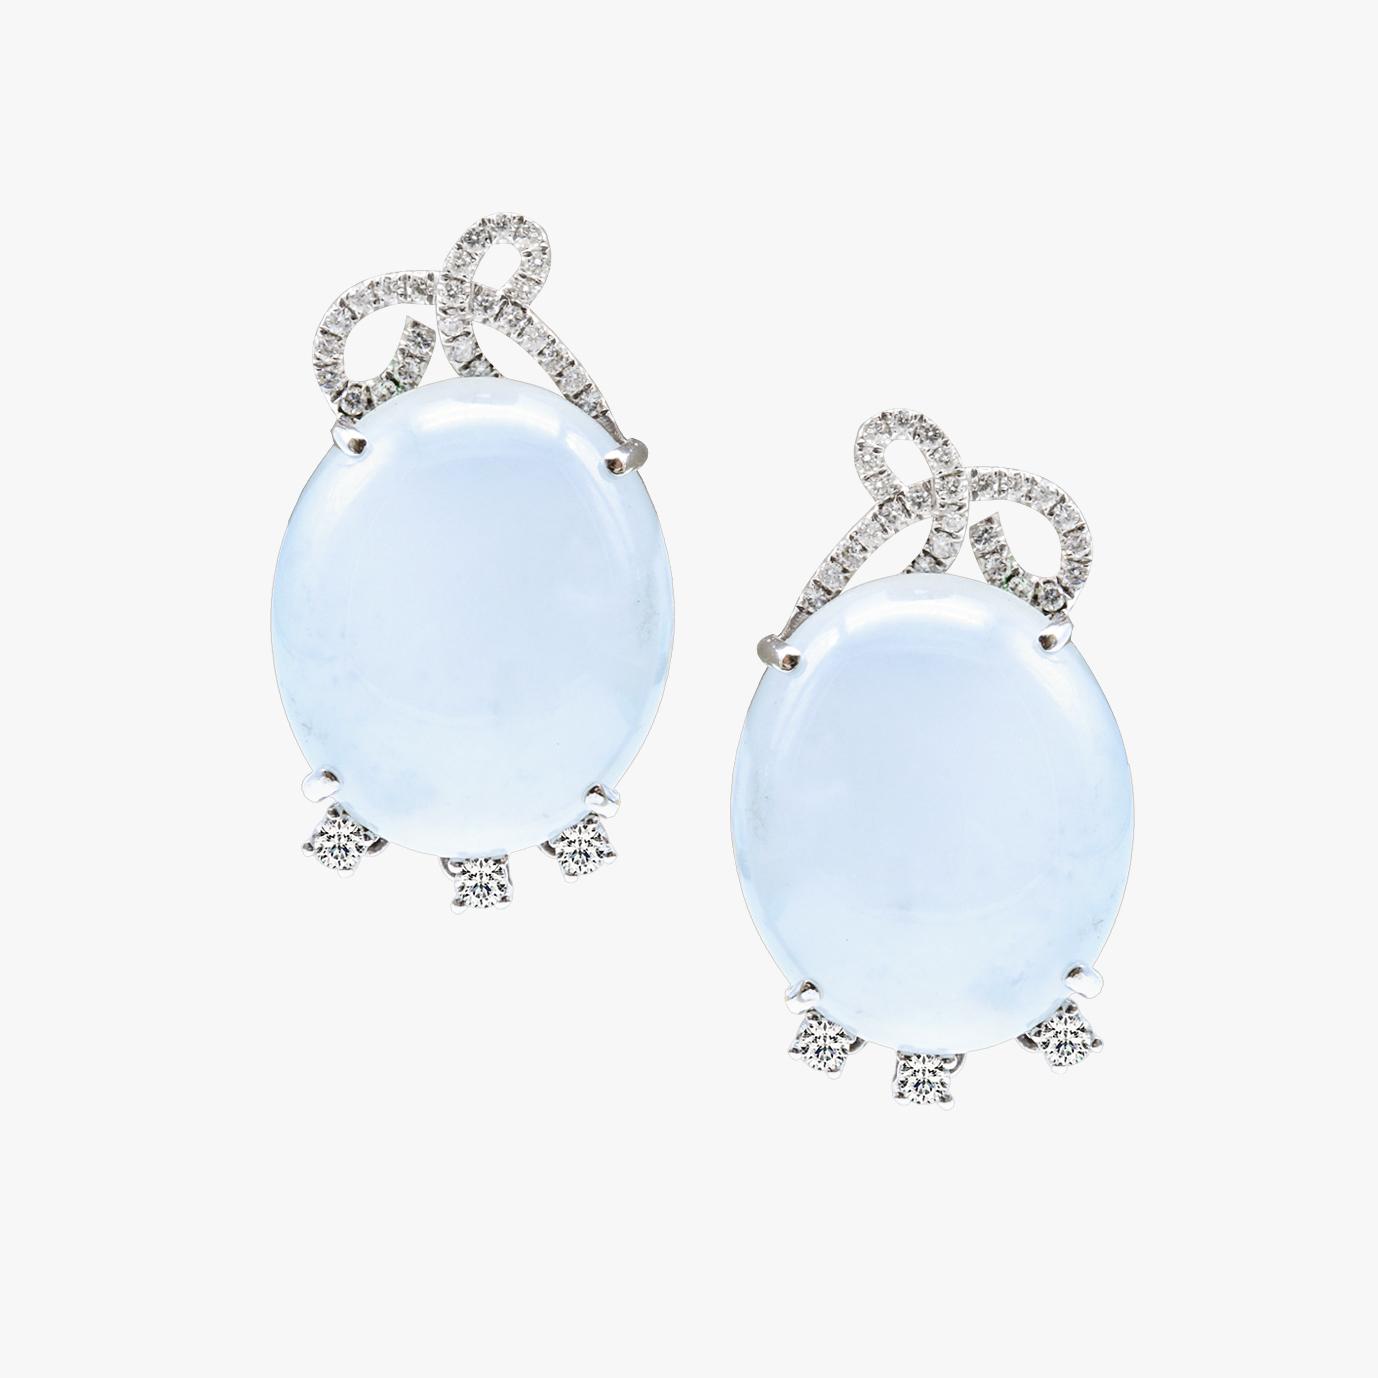 Clear Cabachon Jadeite Jade Earrings